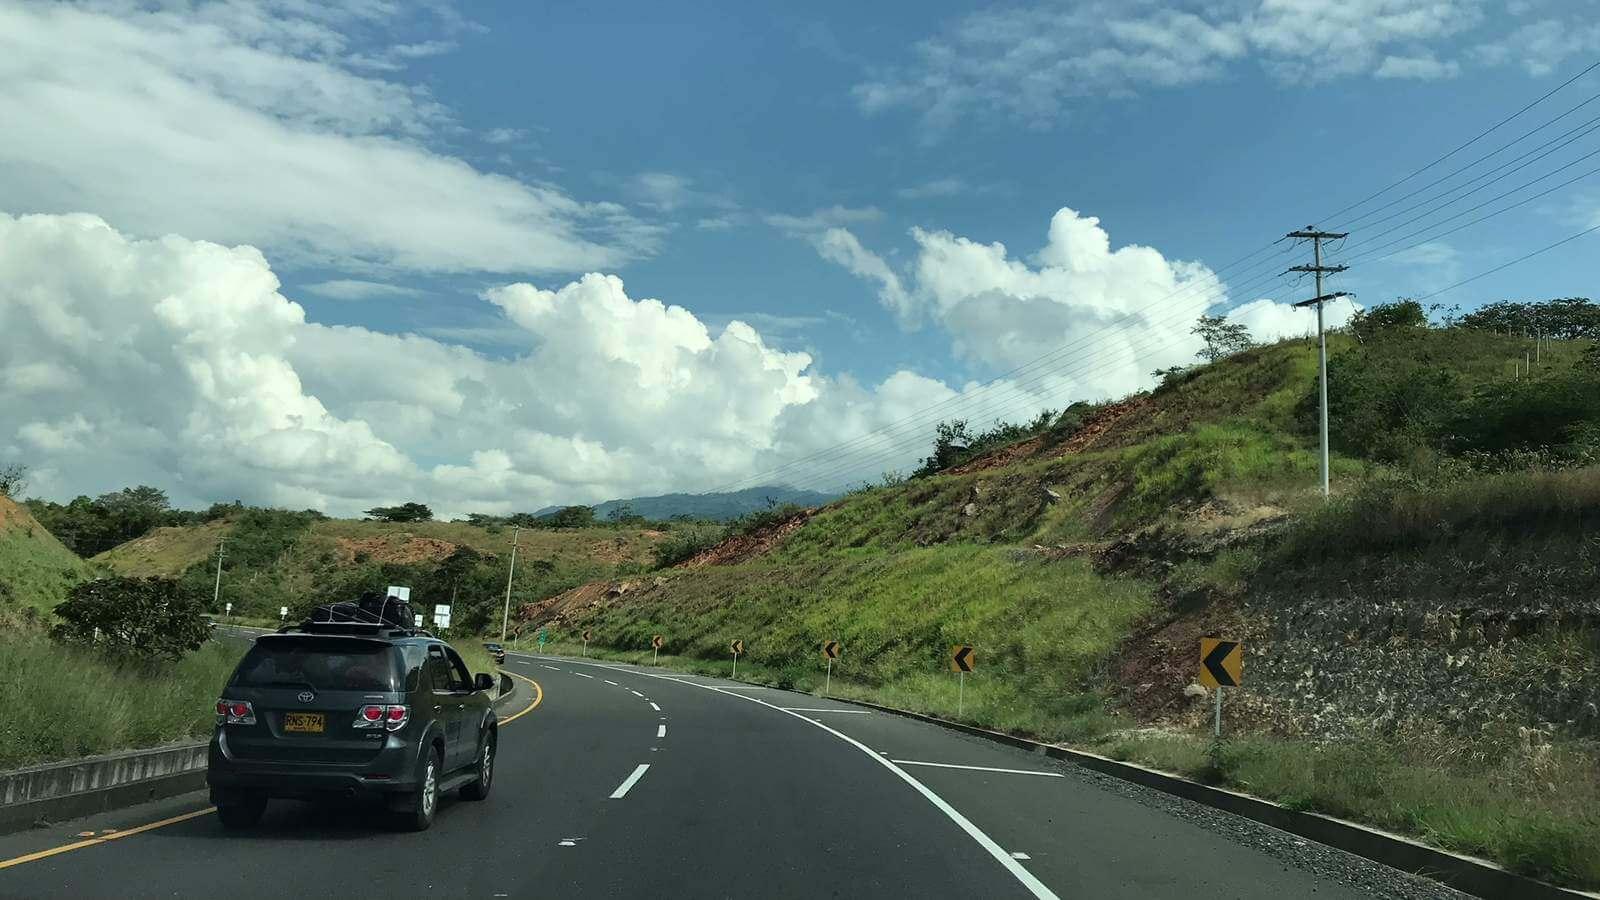 Viajar en carro